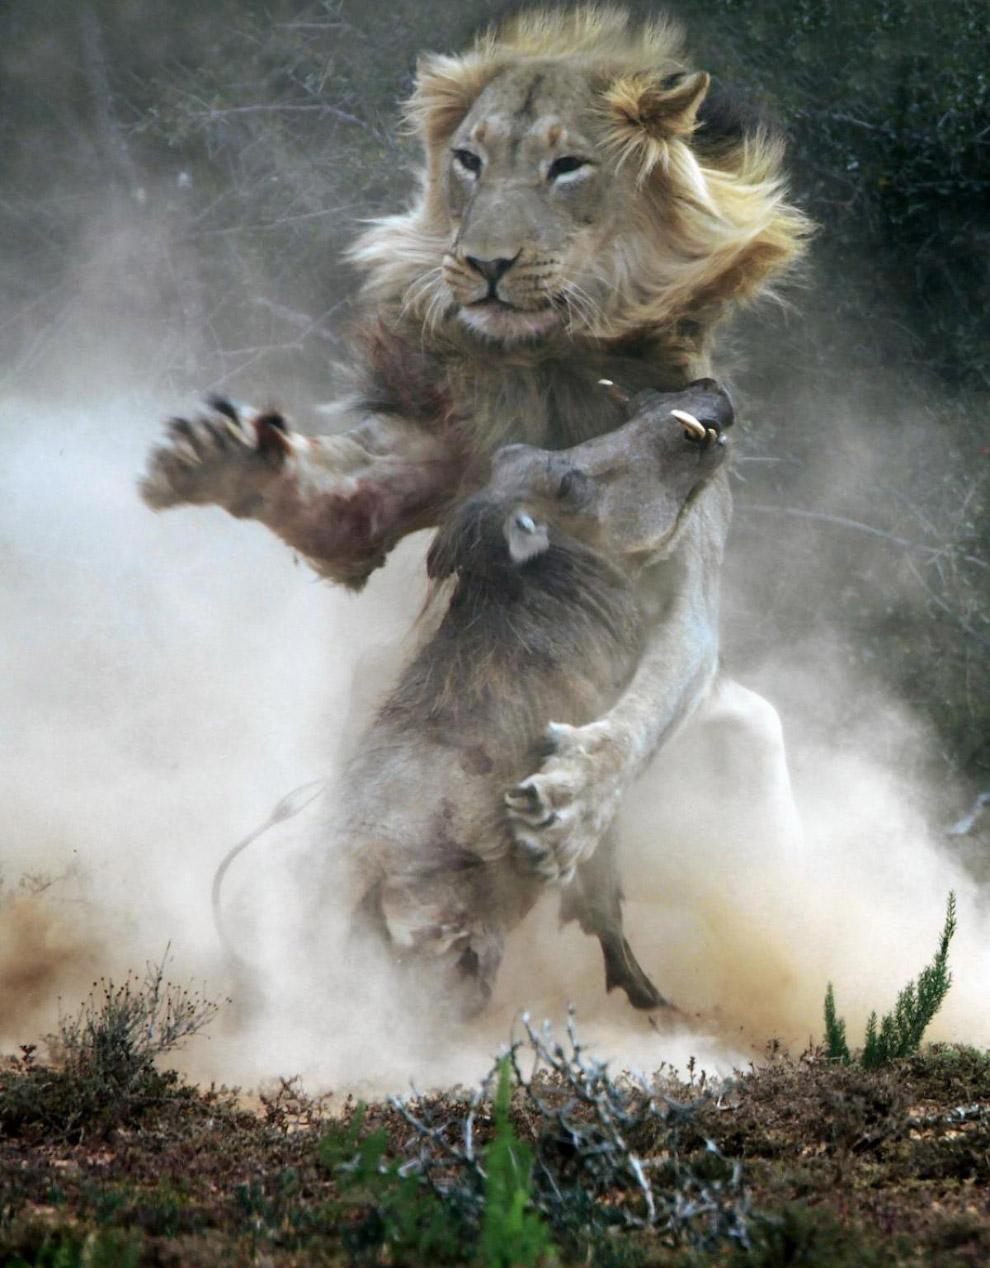 Бородавочник попался на обед ко льву